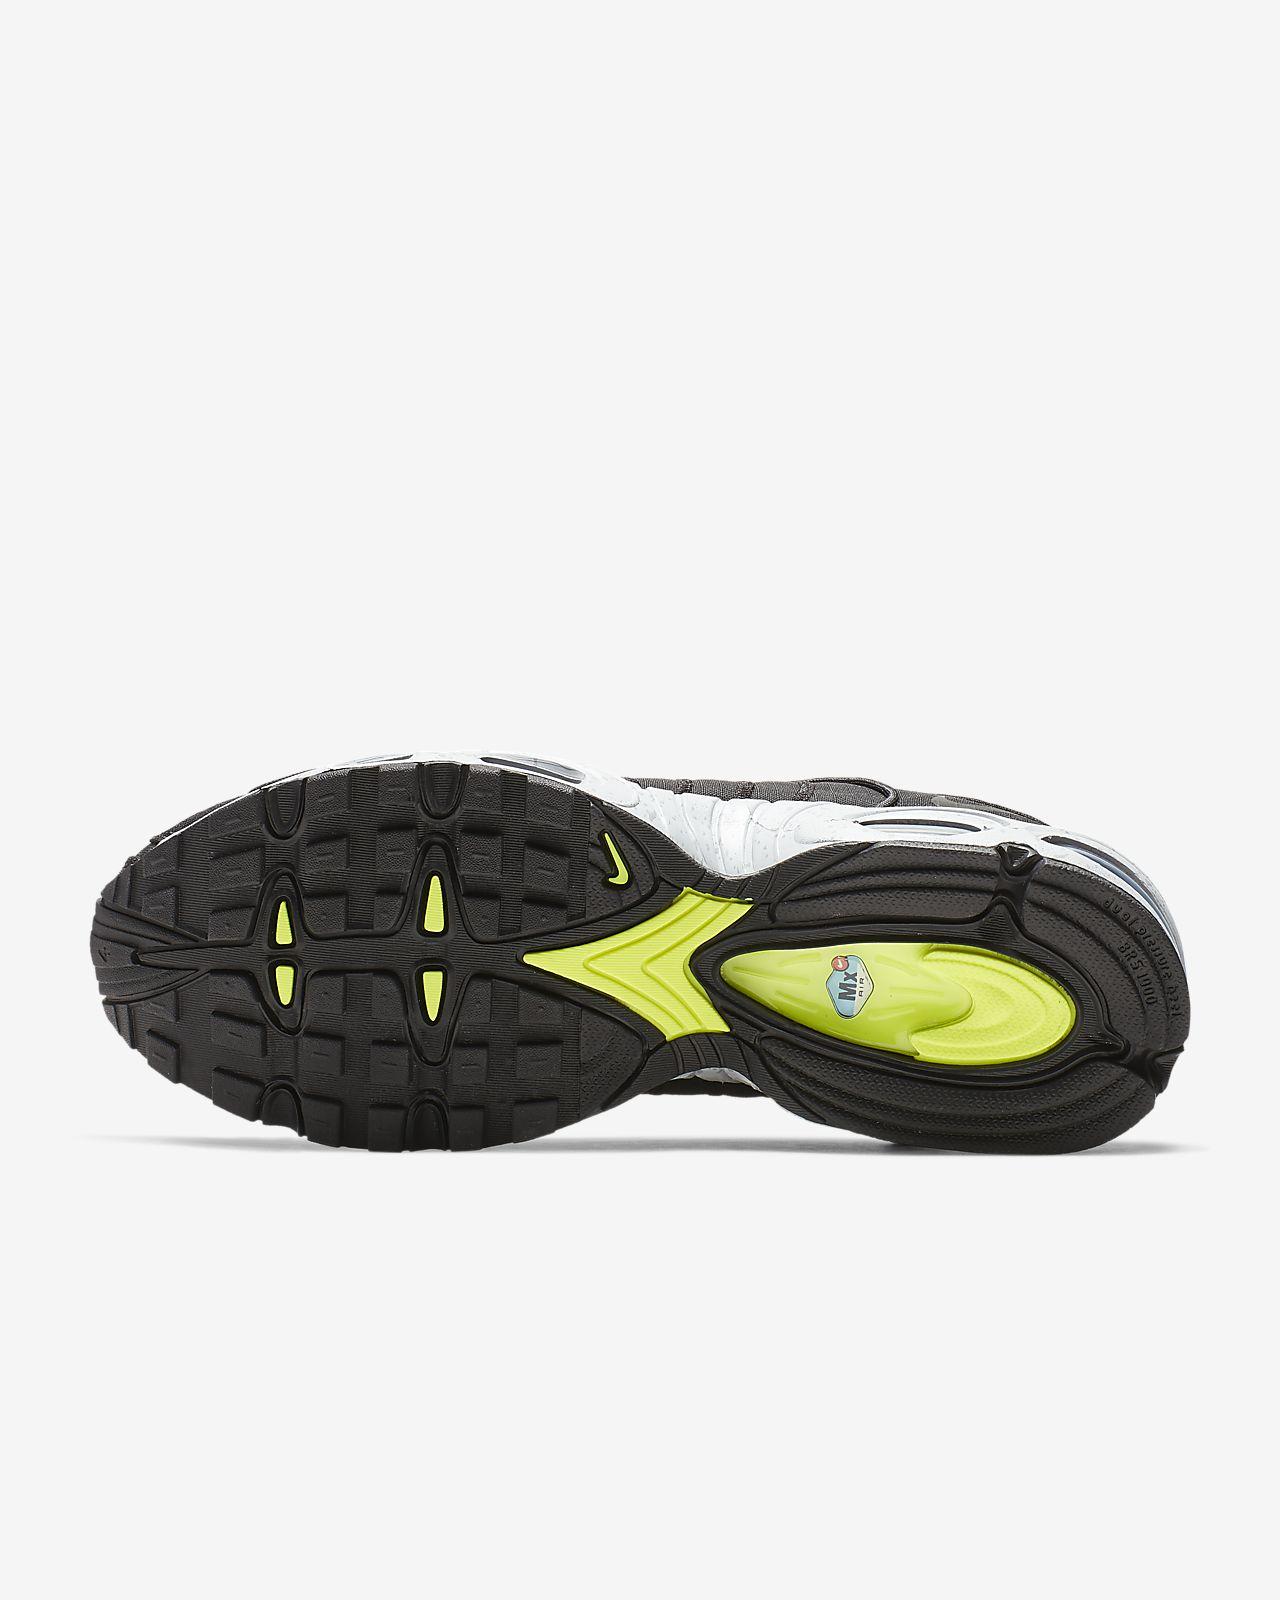 Nike Air Max Tailwind 4 IV Black Wolf Grey Volt BV1357 002